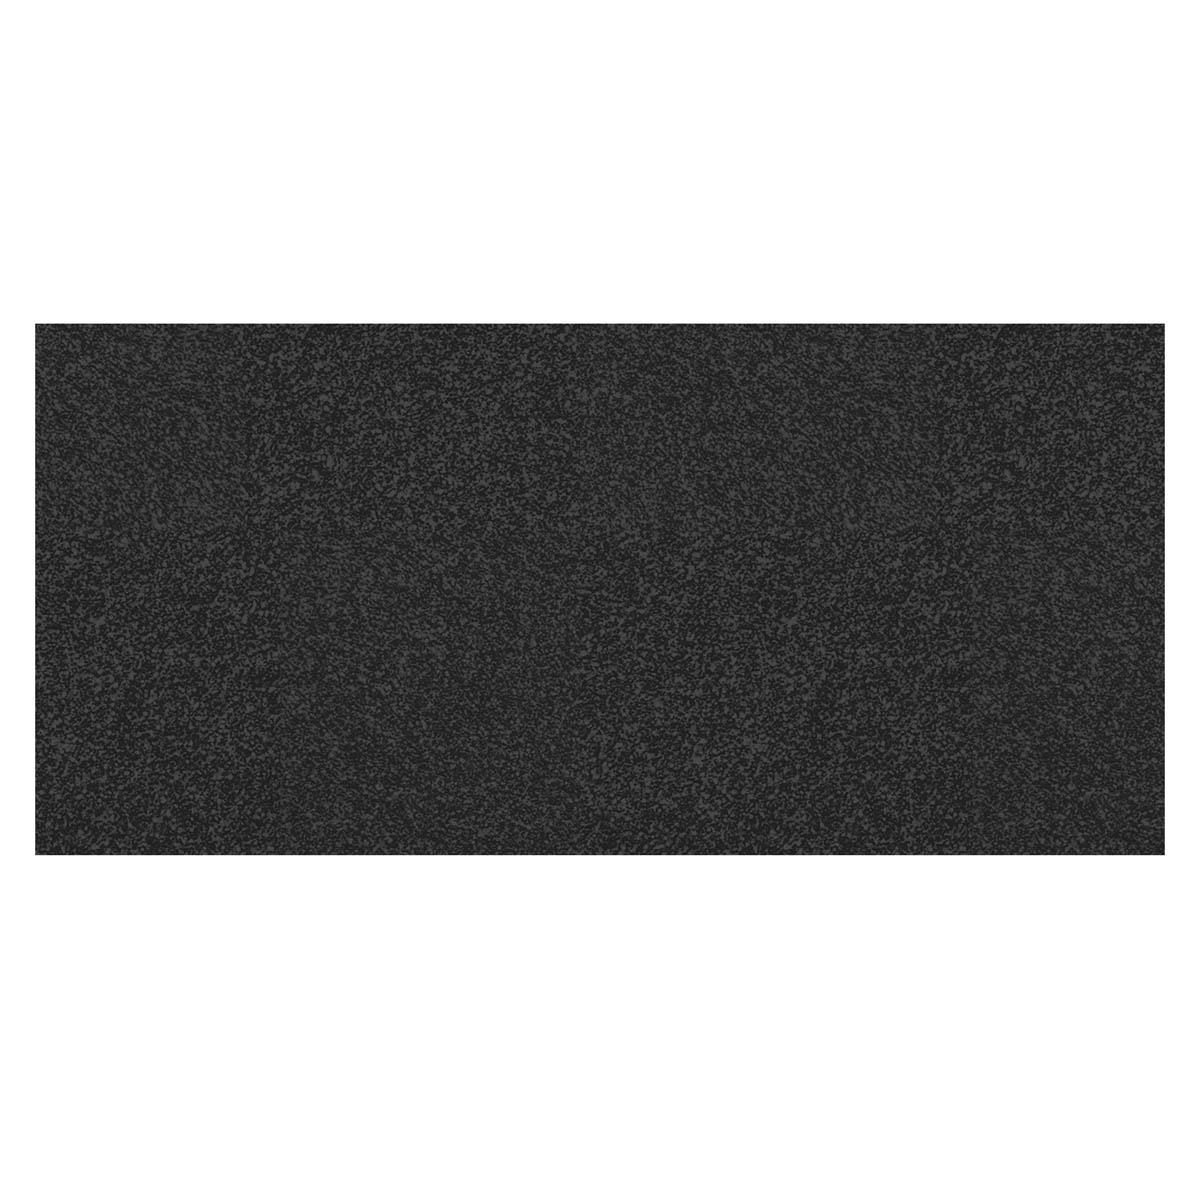 Waverly ® Inspirations Glitter Multi-Surface Acrylic Paint - Black Opal, 2 oz.